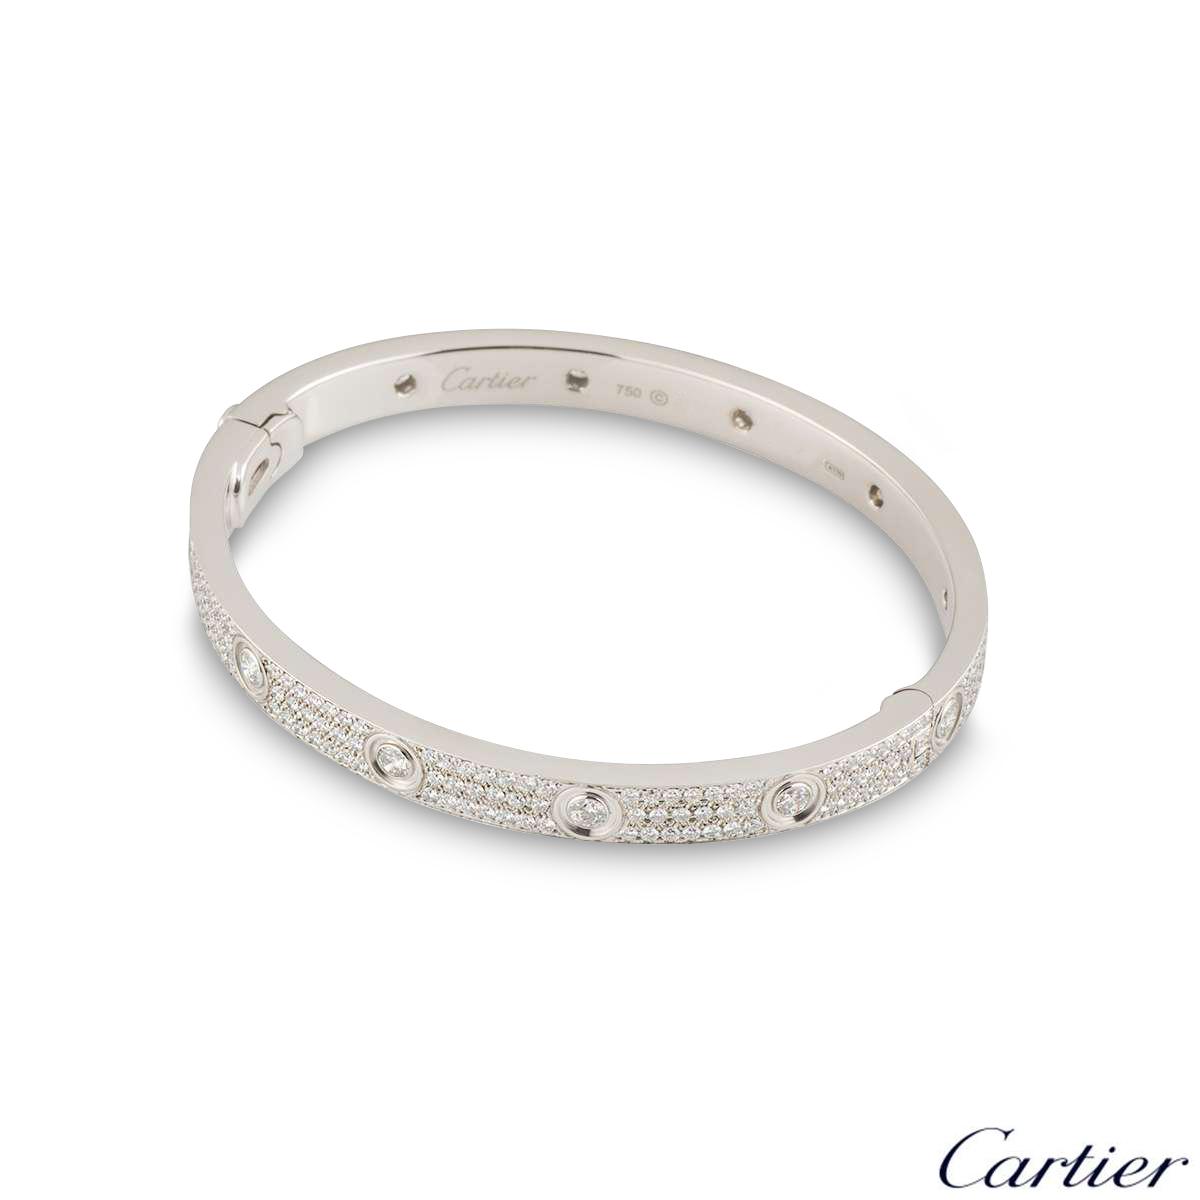 Cartier White Gold Pave Diamond LoveBracelet Size 20N6033602